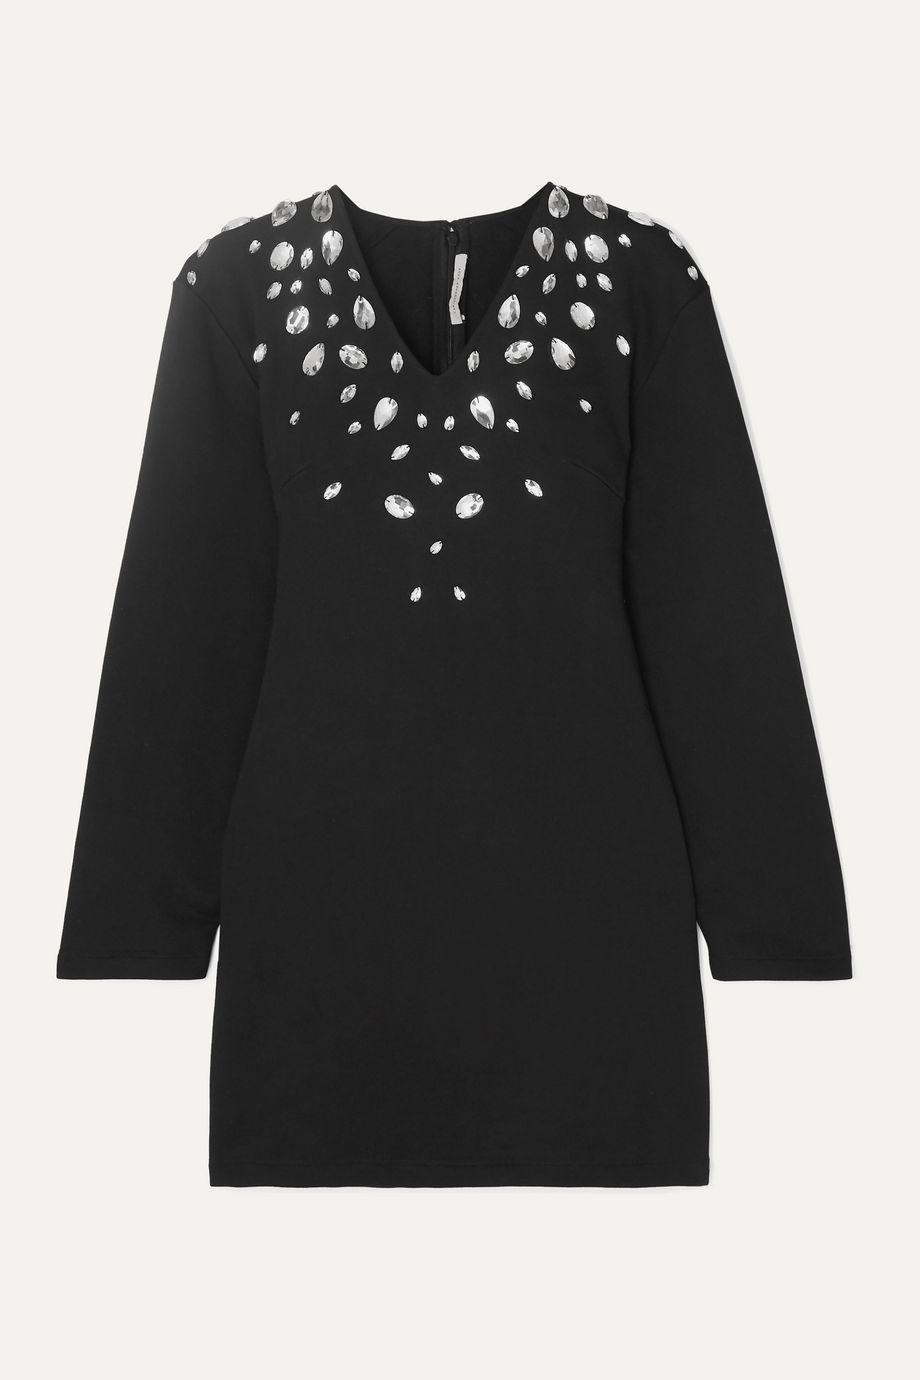 Christopher Kane Cutout crystal-embellished stretch cotton-blend jersey mini dress